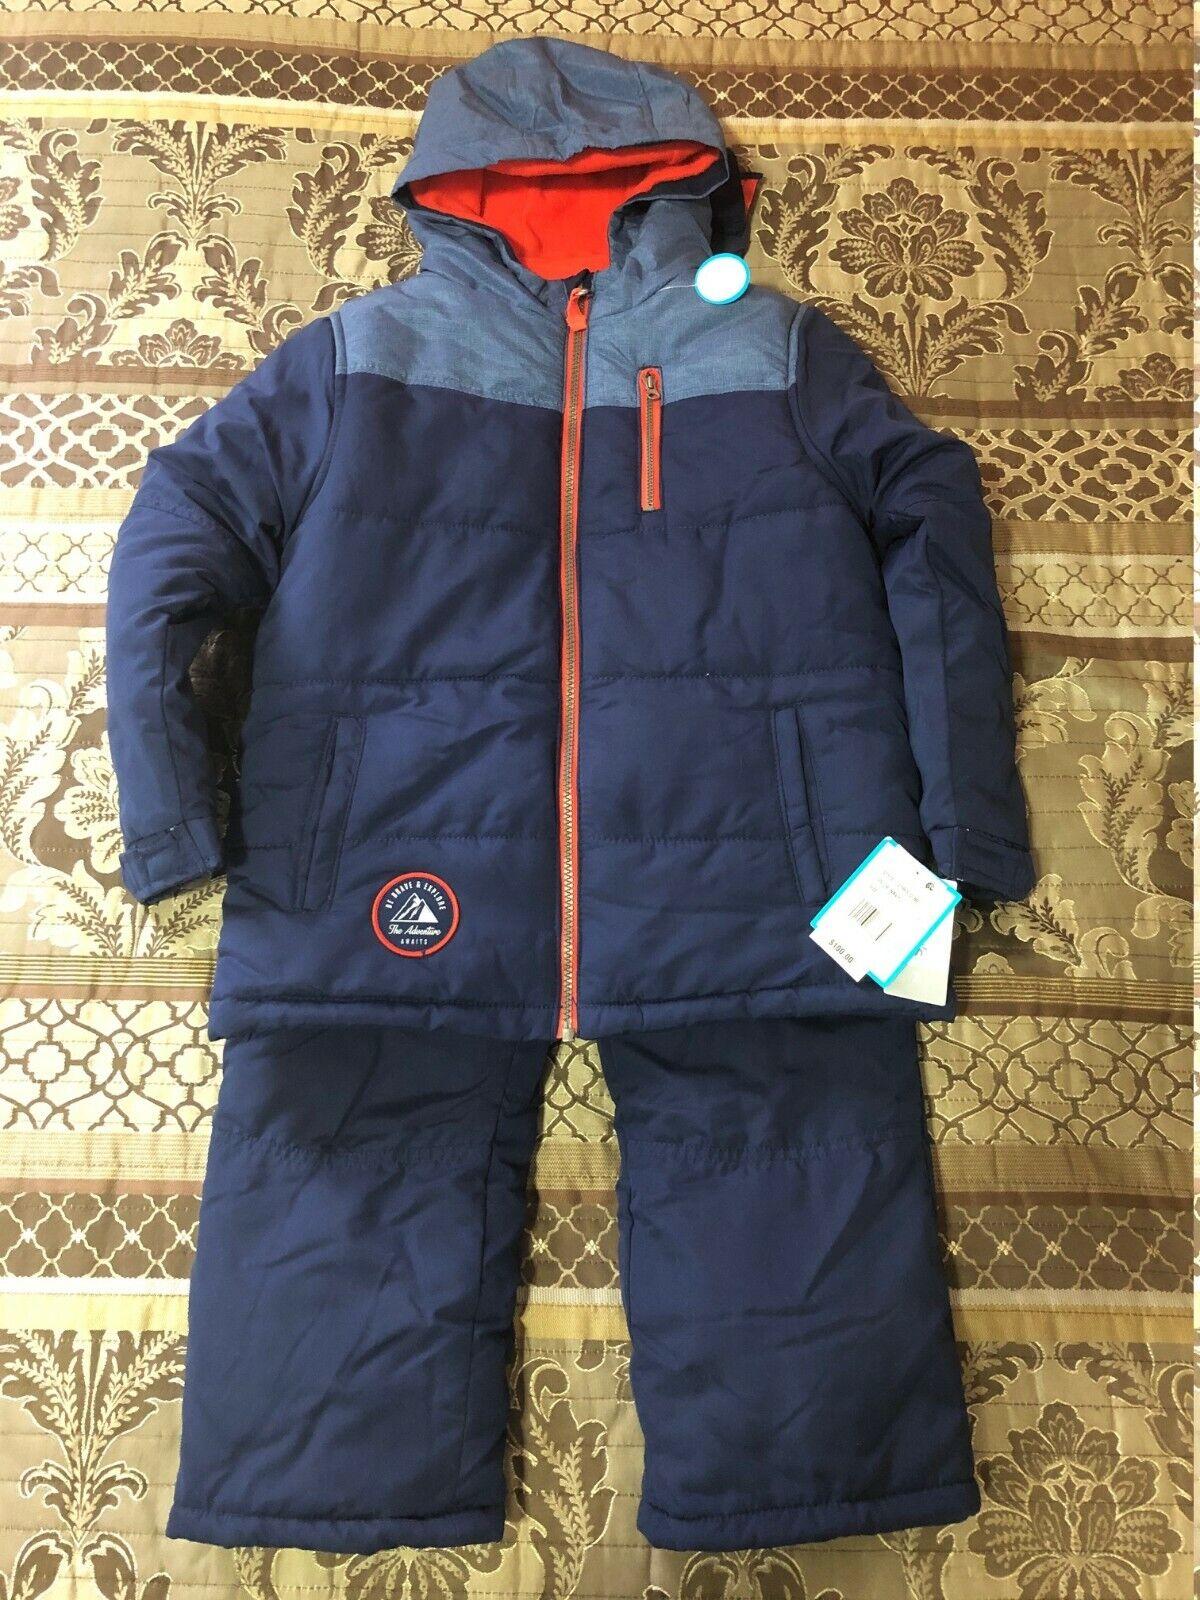 BNWT Carter's Boys 2-Piece Snowsuit Set Size 7